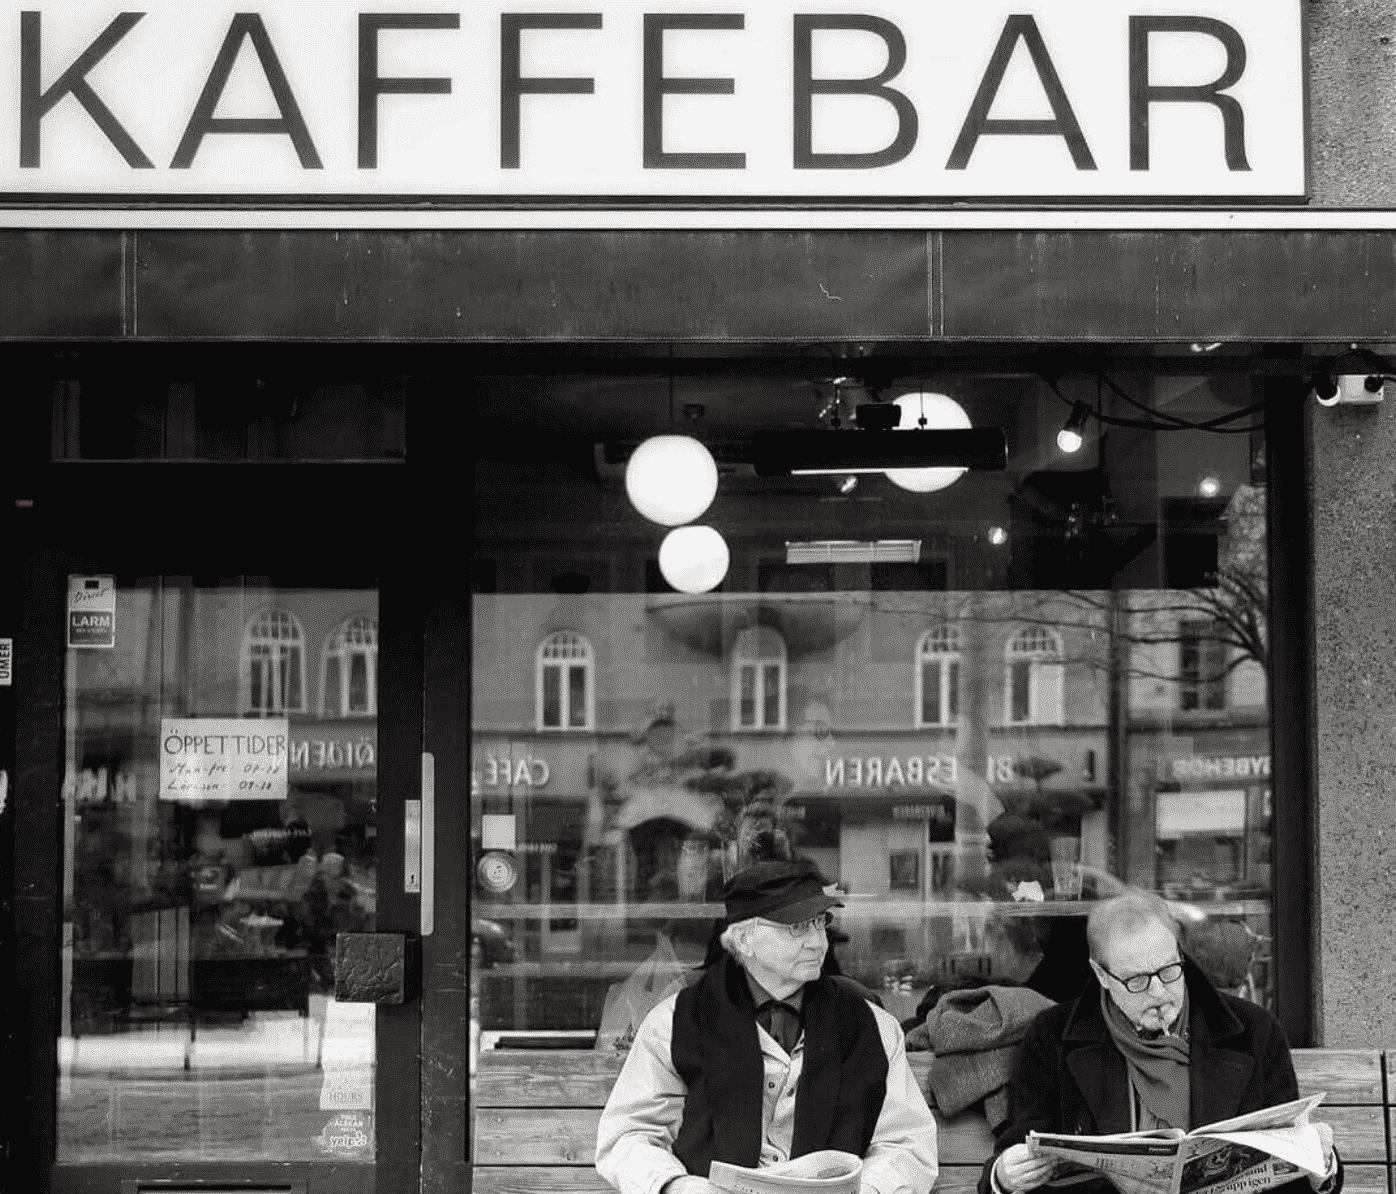 Kaffebar in Stockholm